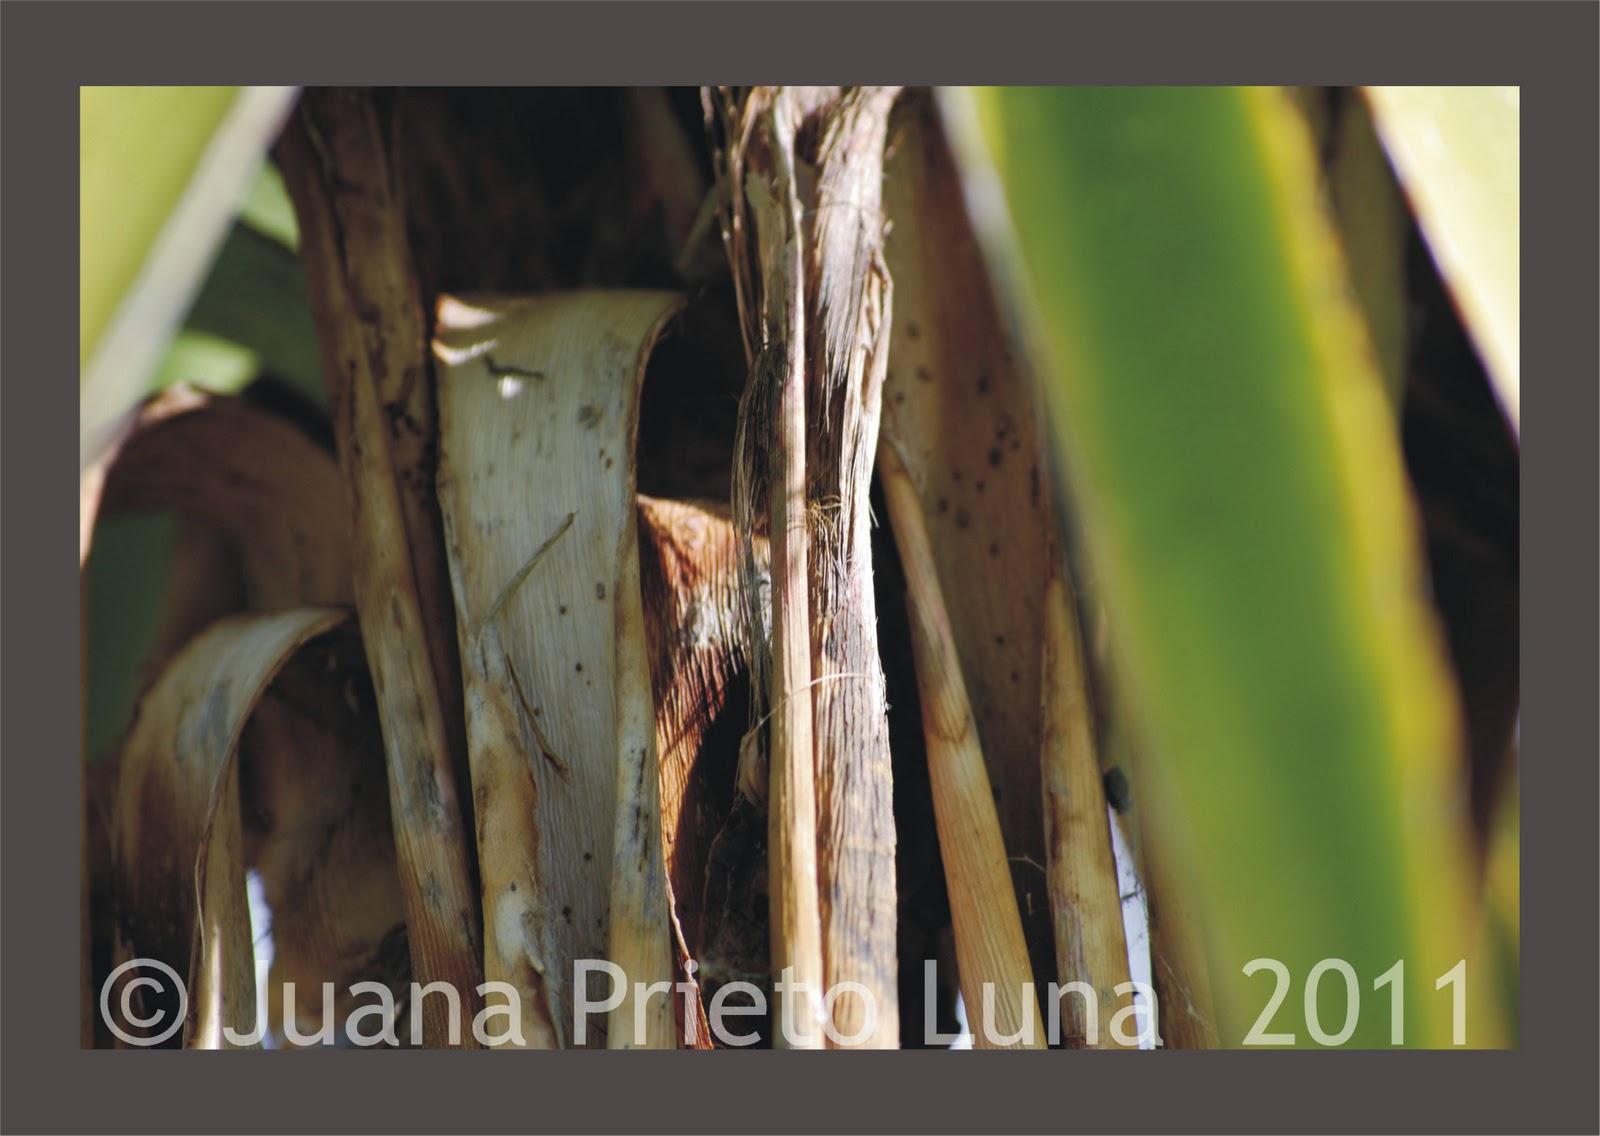 Juana prieto luna lo vegetal - Reproduccion del bambu ...